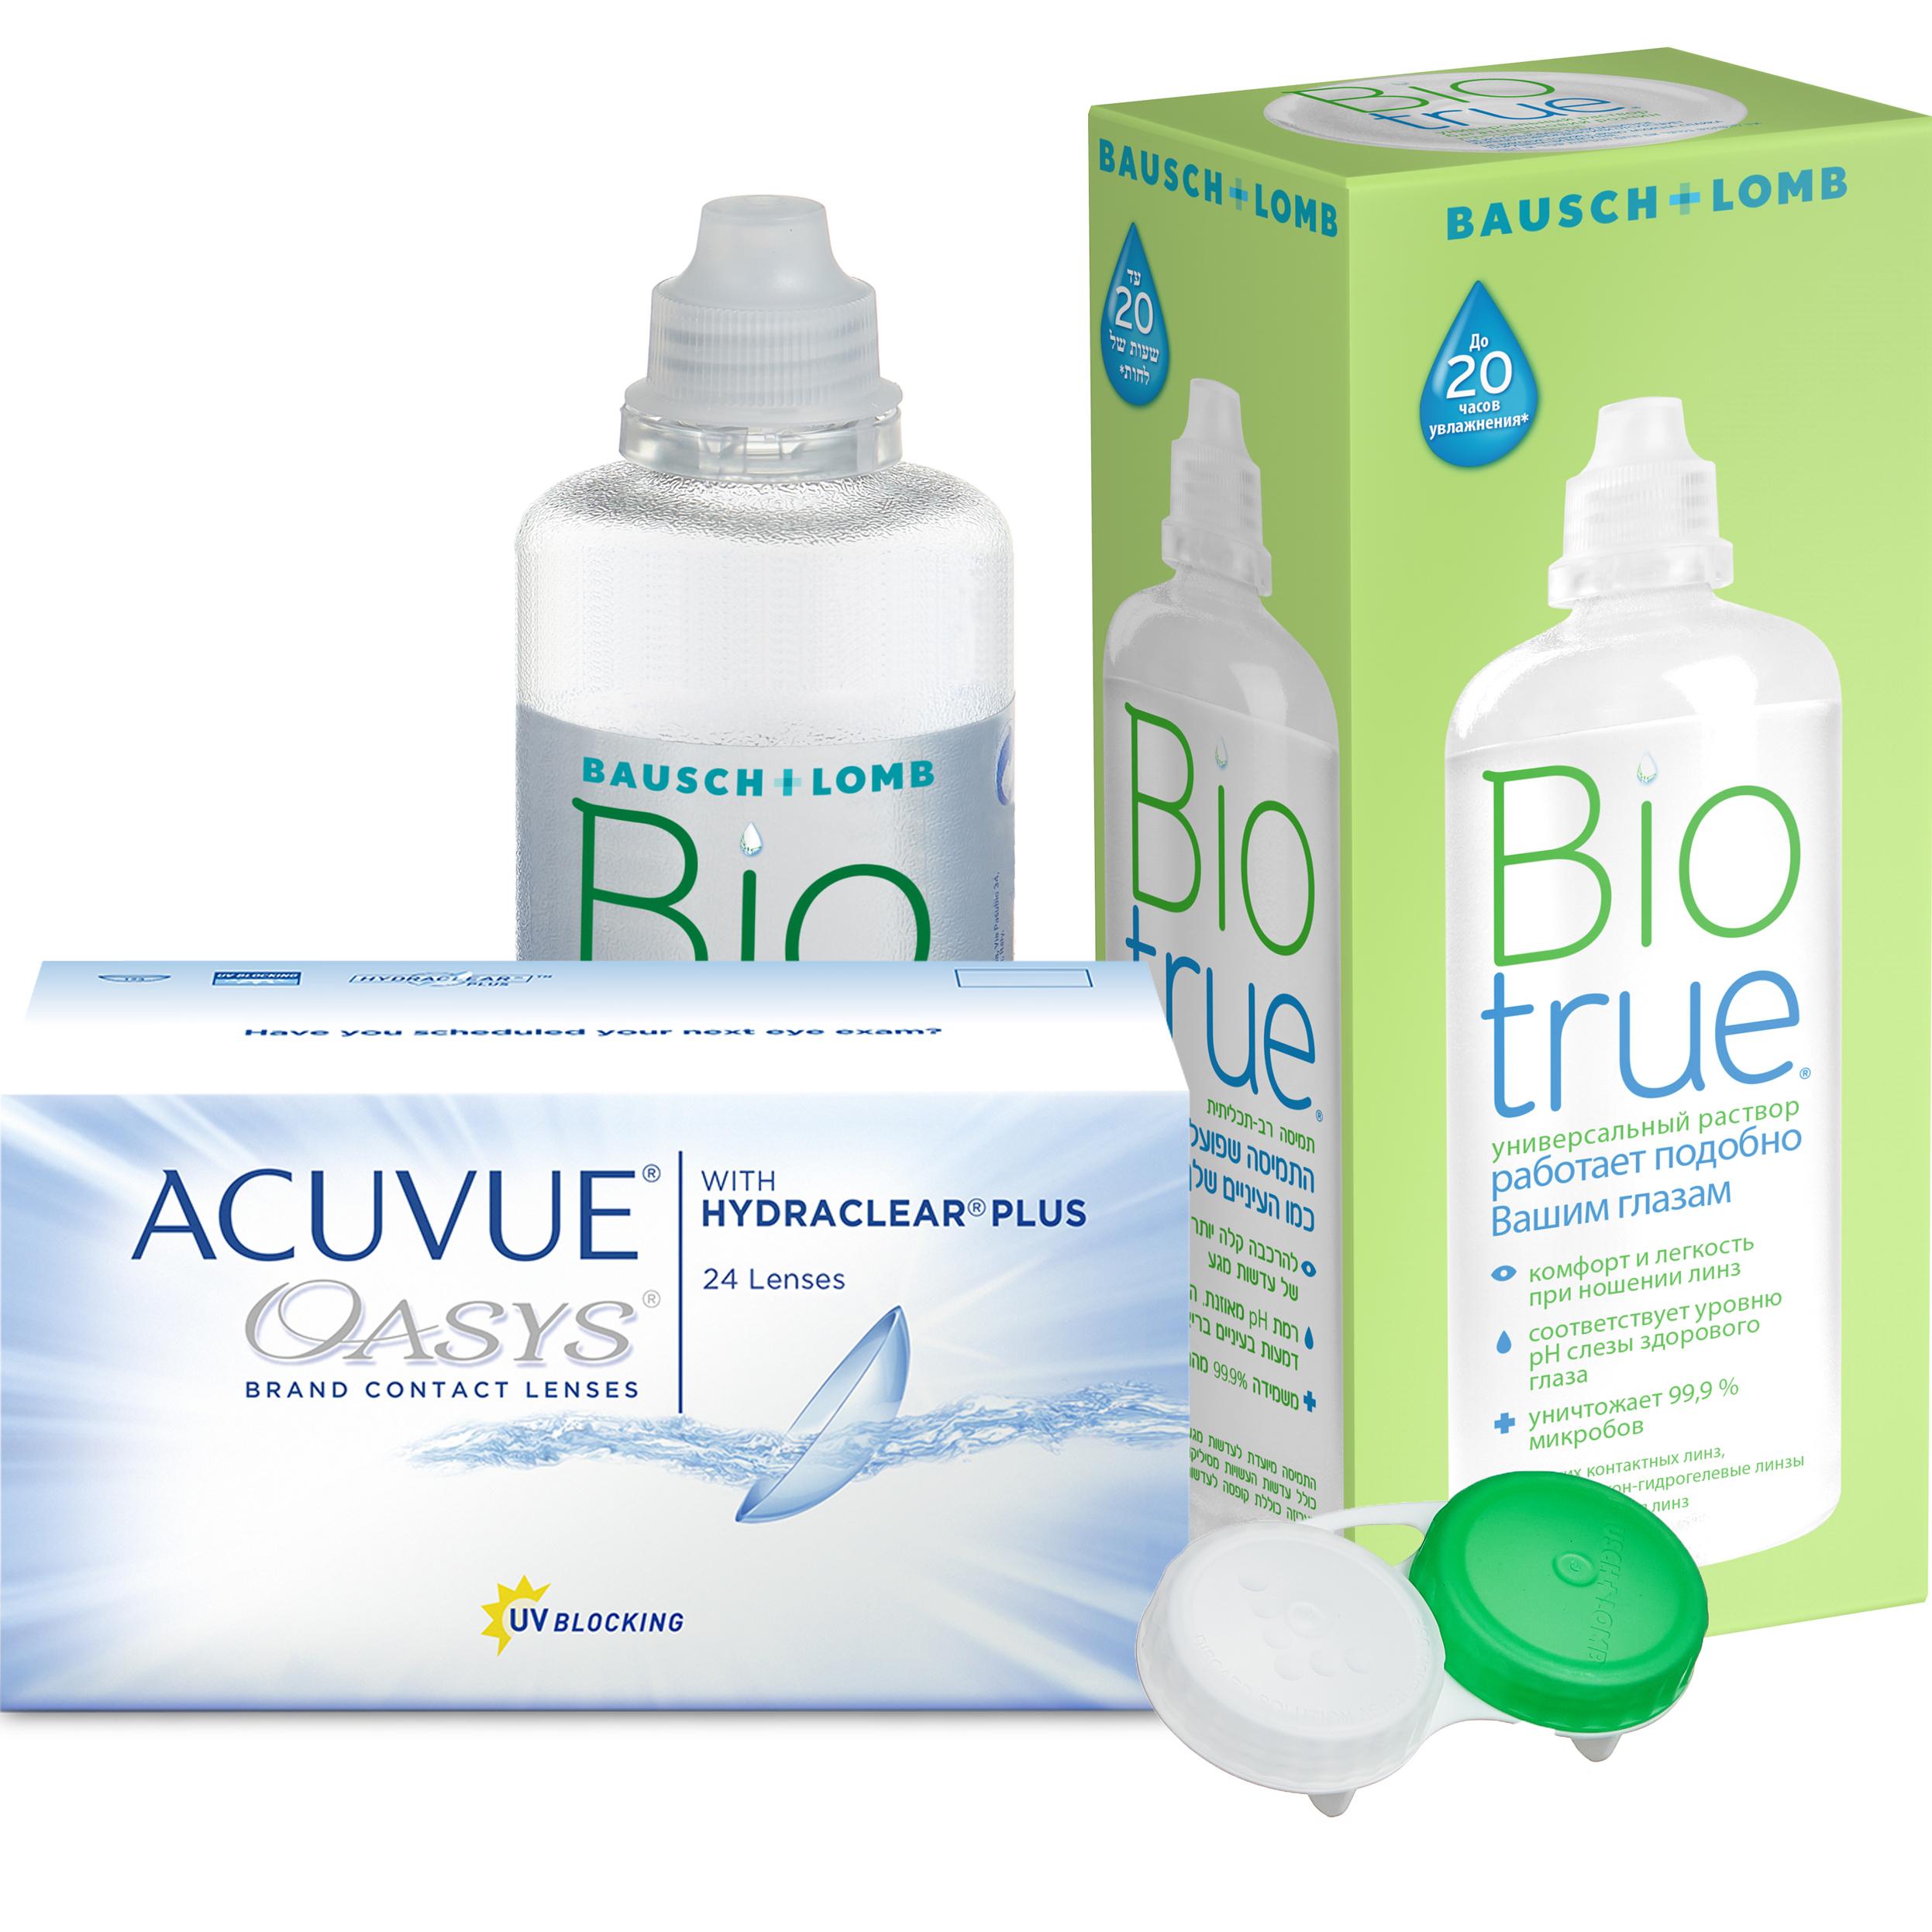 Купить Oasys with Hydraclear Plus 24 линзы + Biotrue, Контактные линзы Acuvue Oasys with Hydraclear Plus 24 линзы R 8.8 +3, 75 + Biotrue 300 мл